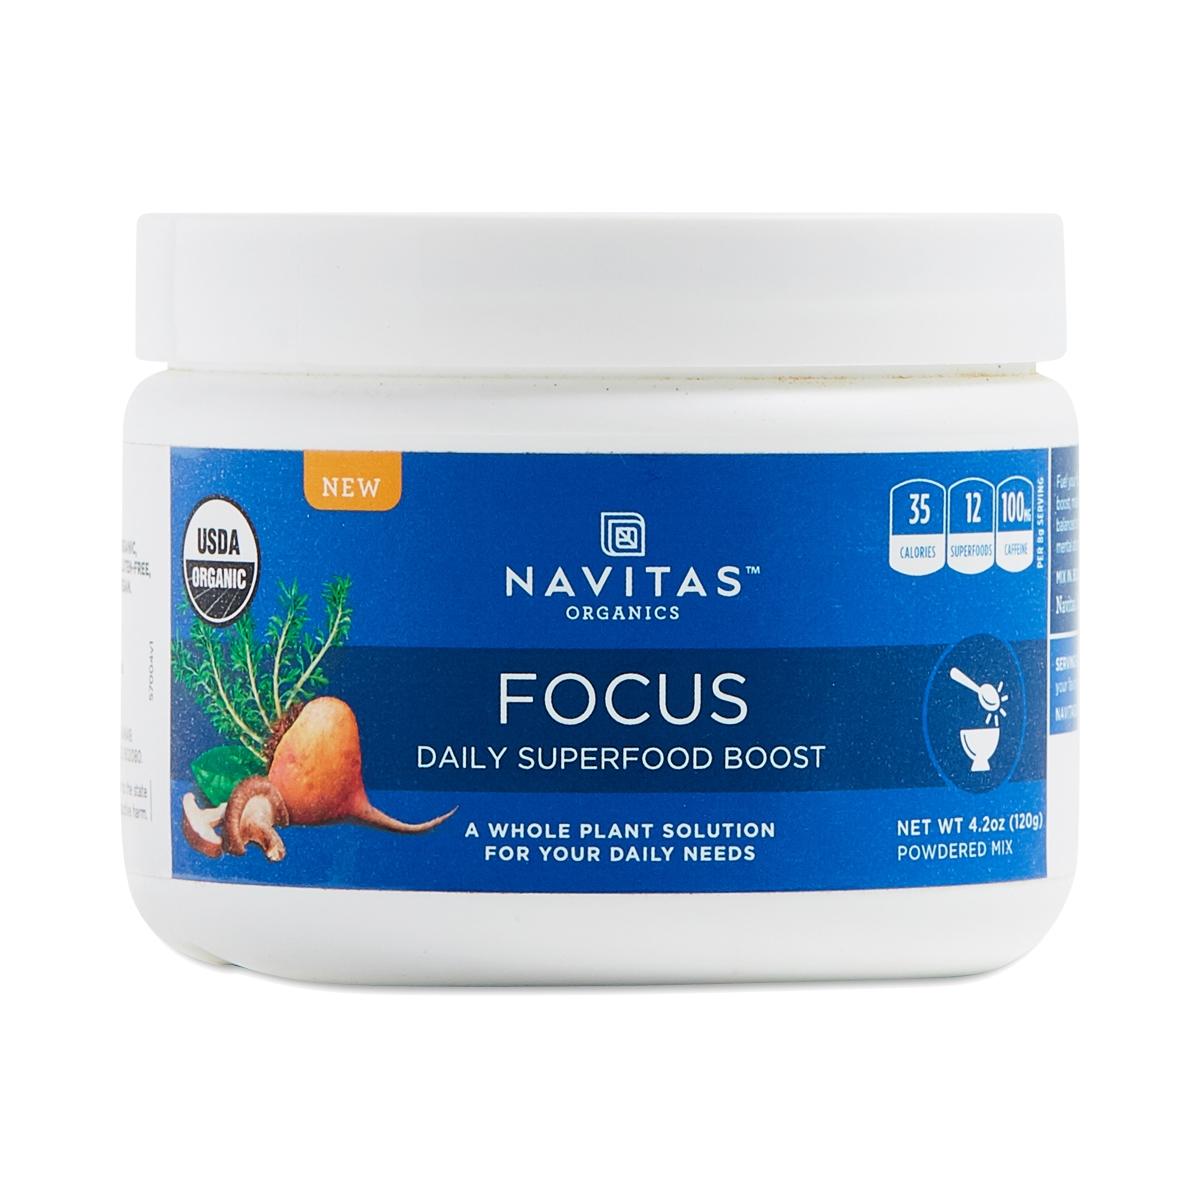 Navitas Organics Daily Superfood Boost - Focus 4.2 oz tub